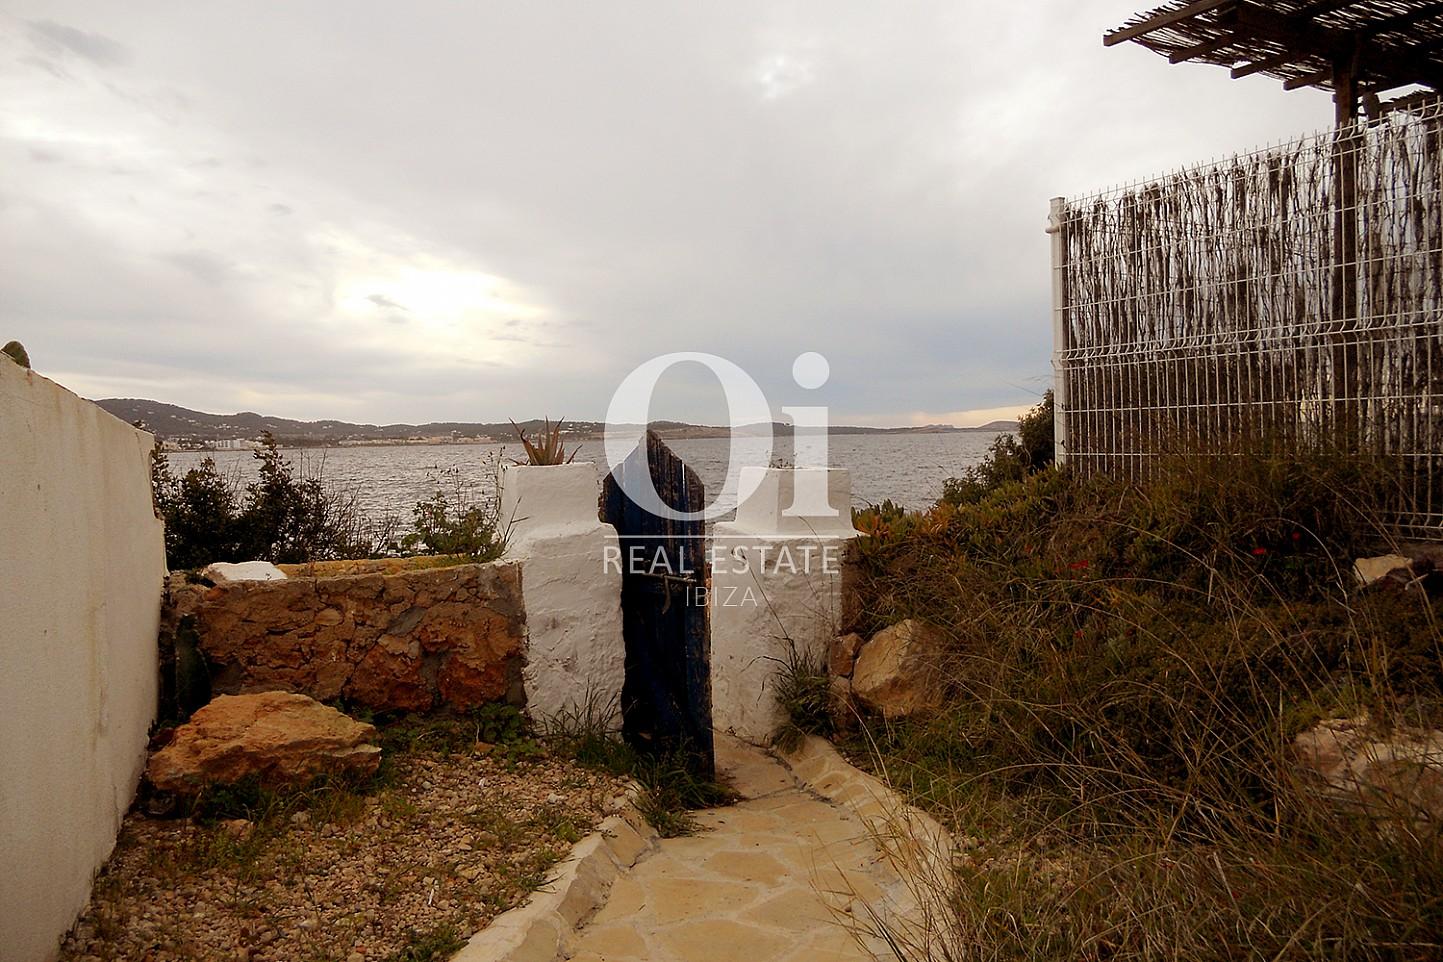 Exteriores de piso en venta en Cala Gració, zona de Sant Antoni, Ibiza